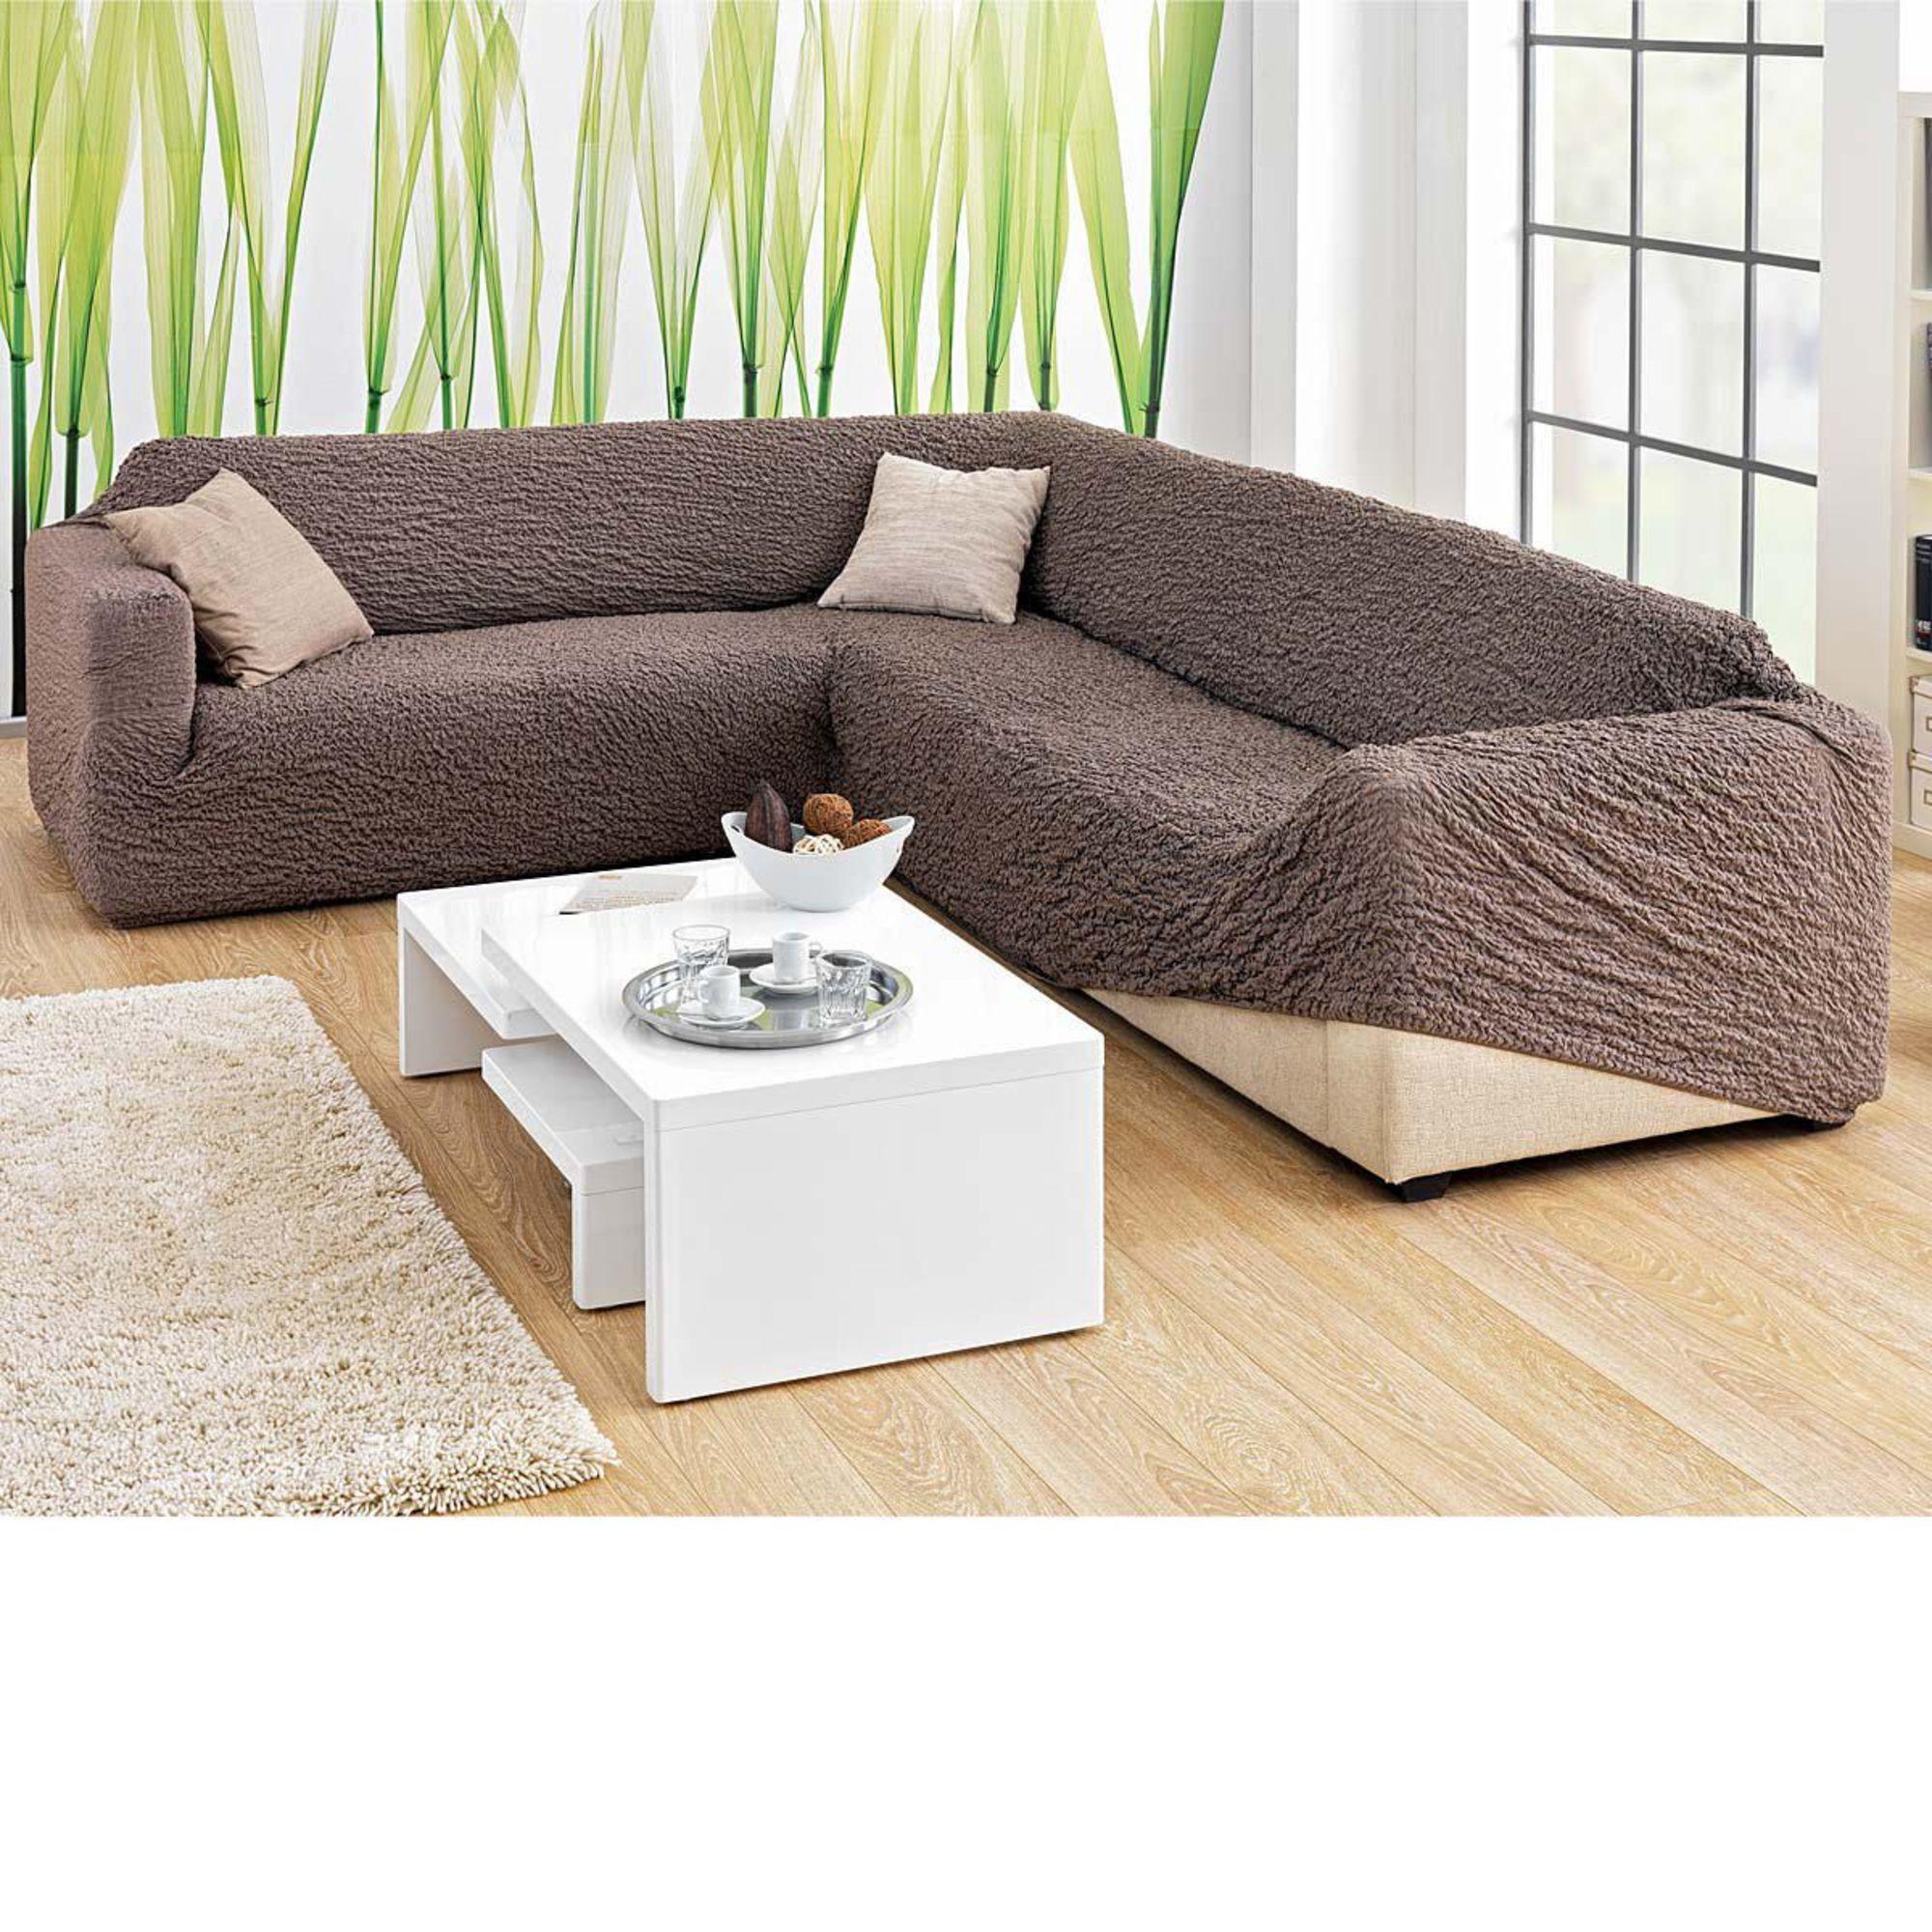 sofahusse bestseller shop f r m bel und einrichtungen. Black Bedroom Furniture Sets. Home Design Ideas